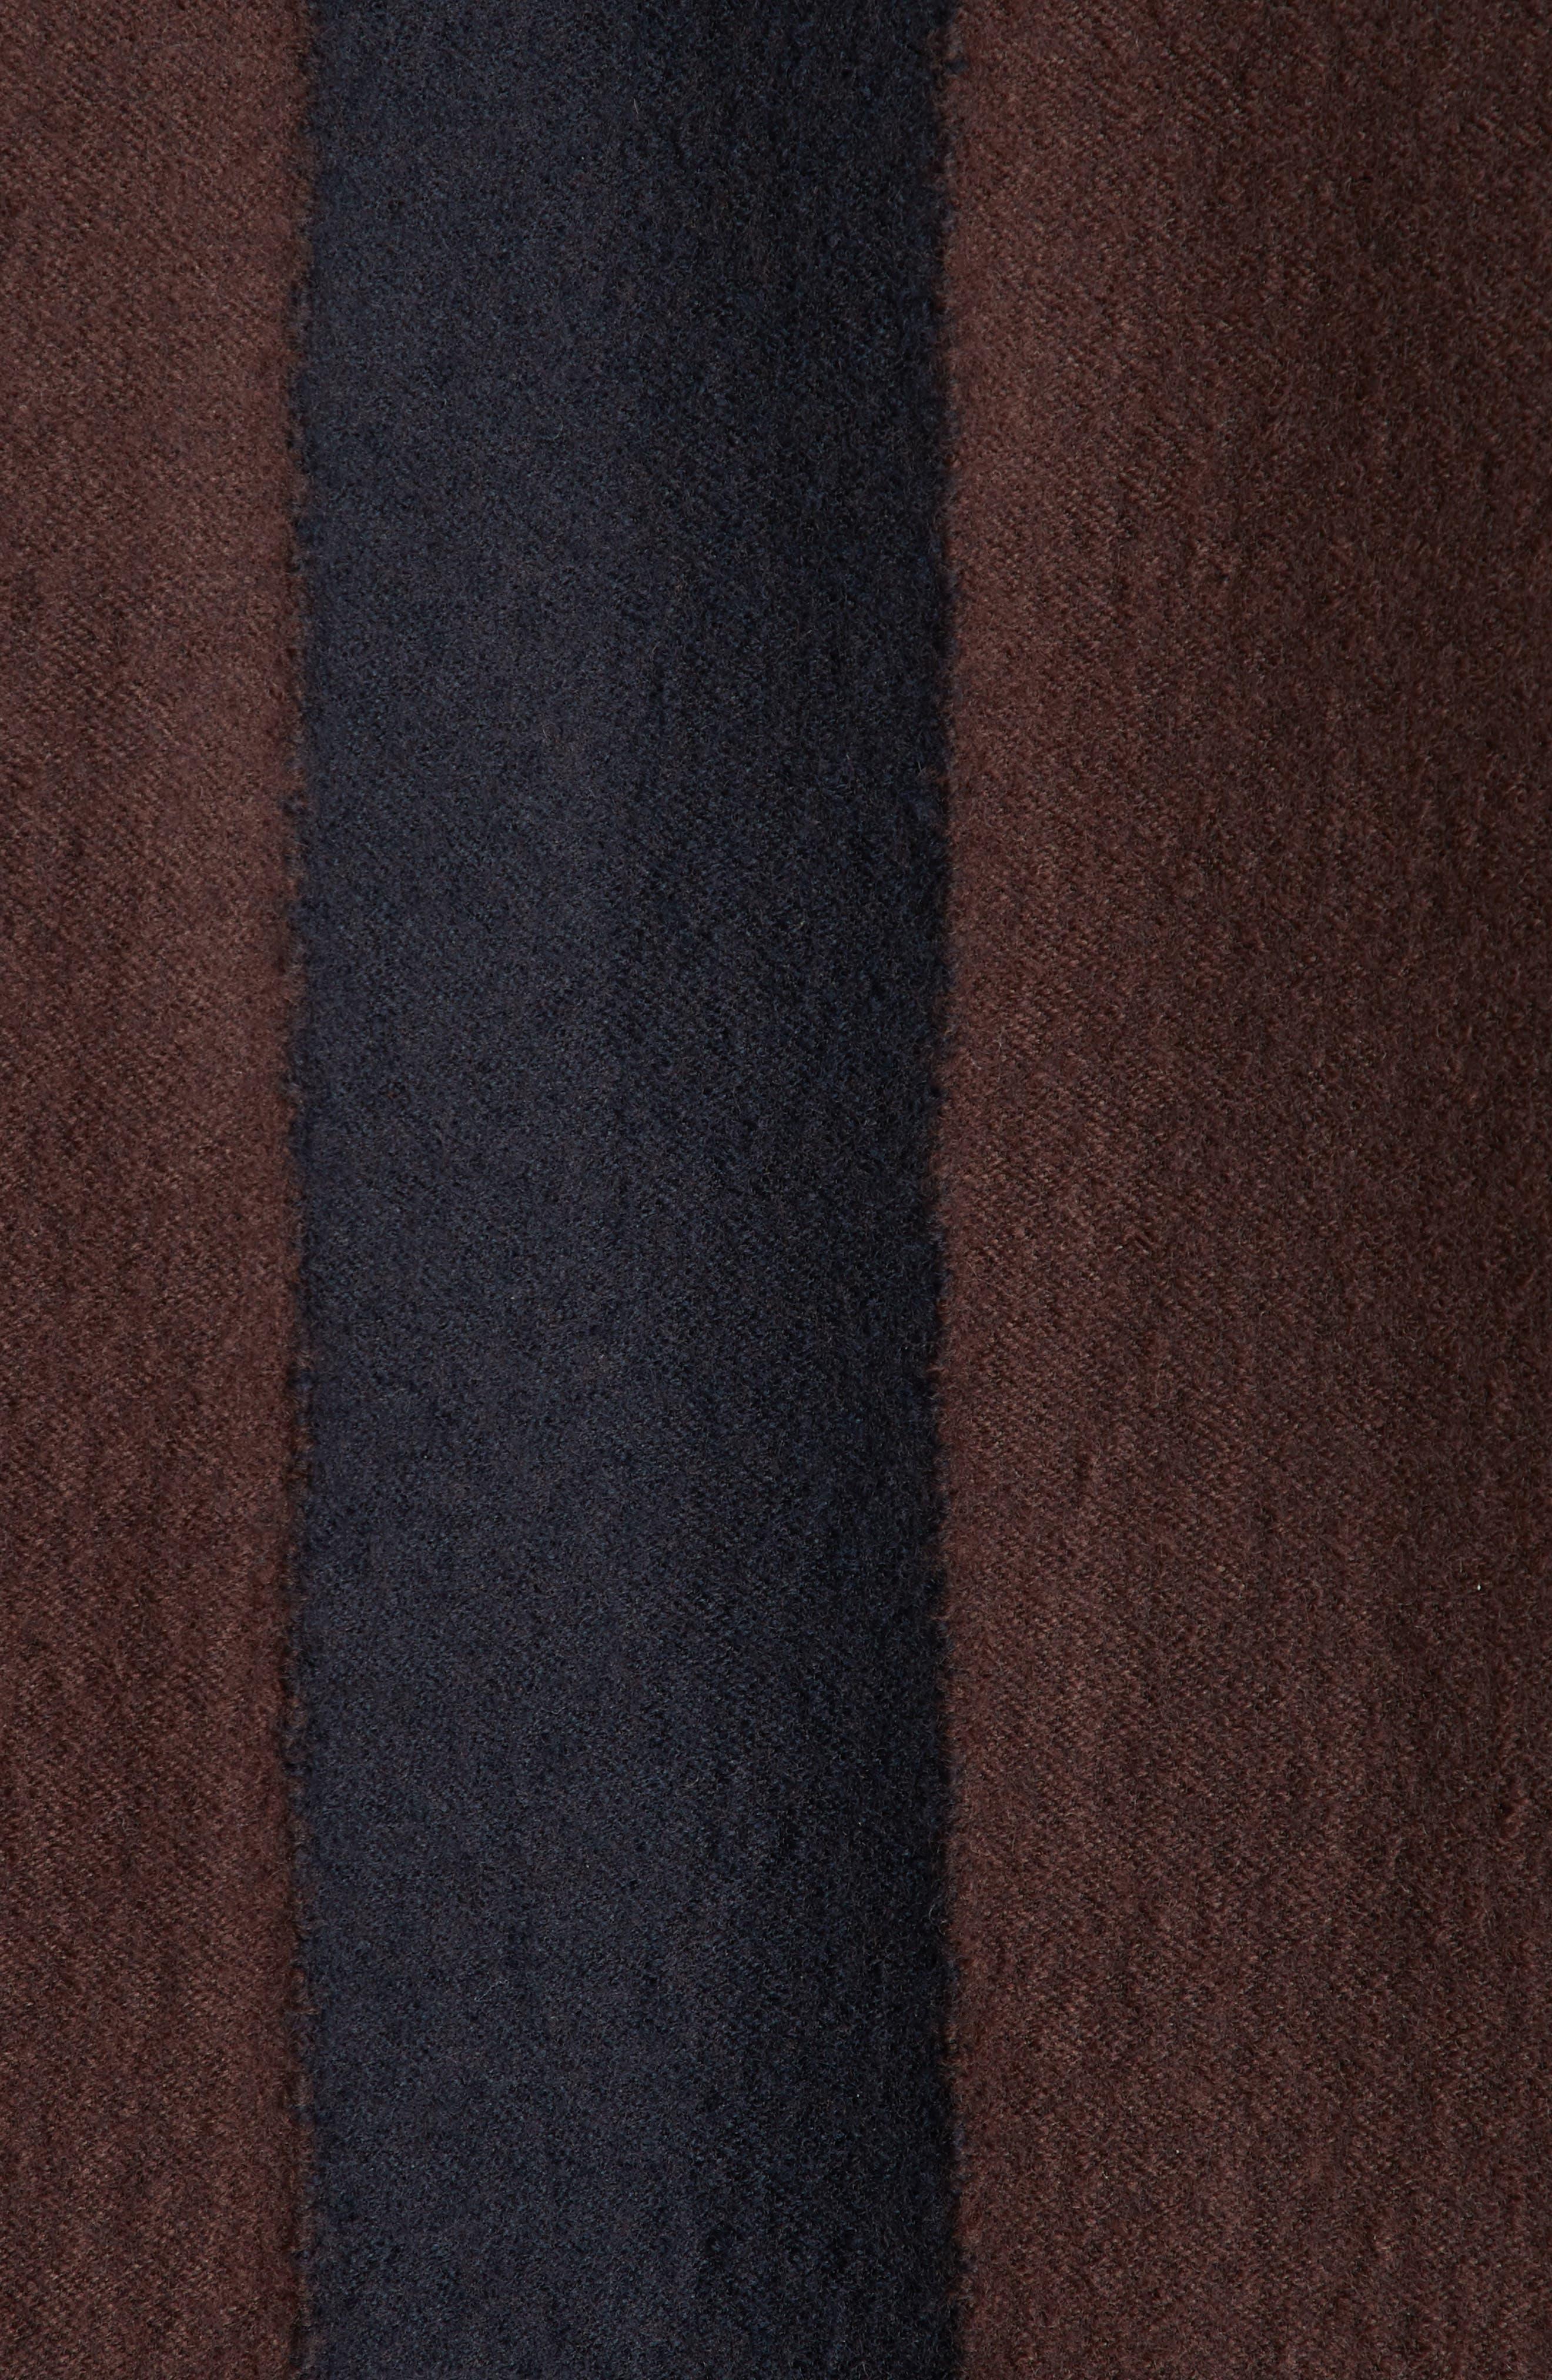 Stripe Wool Blend Jacket,                             Alternate thumbnail 6, color,                             001